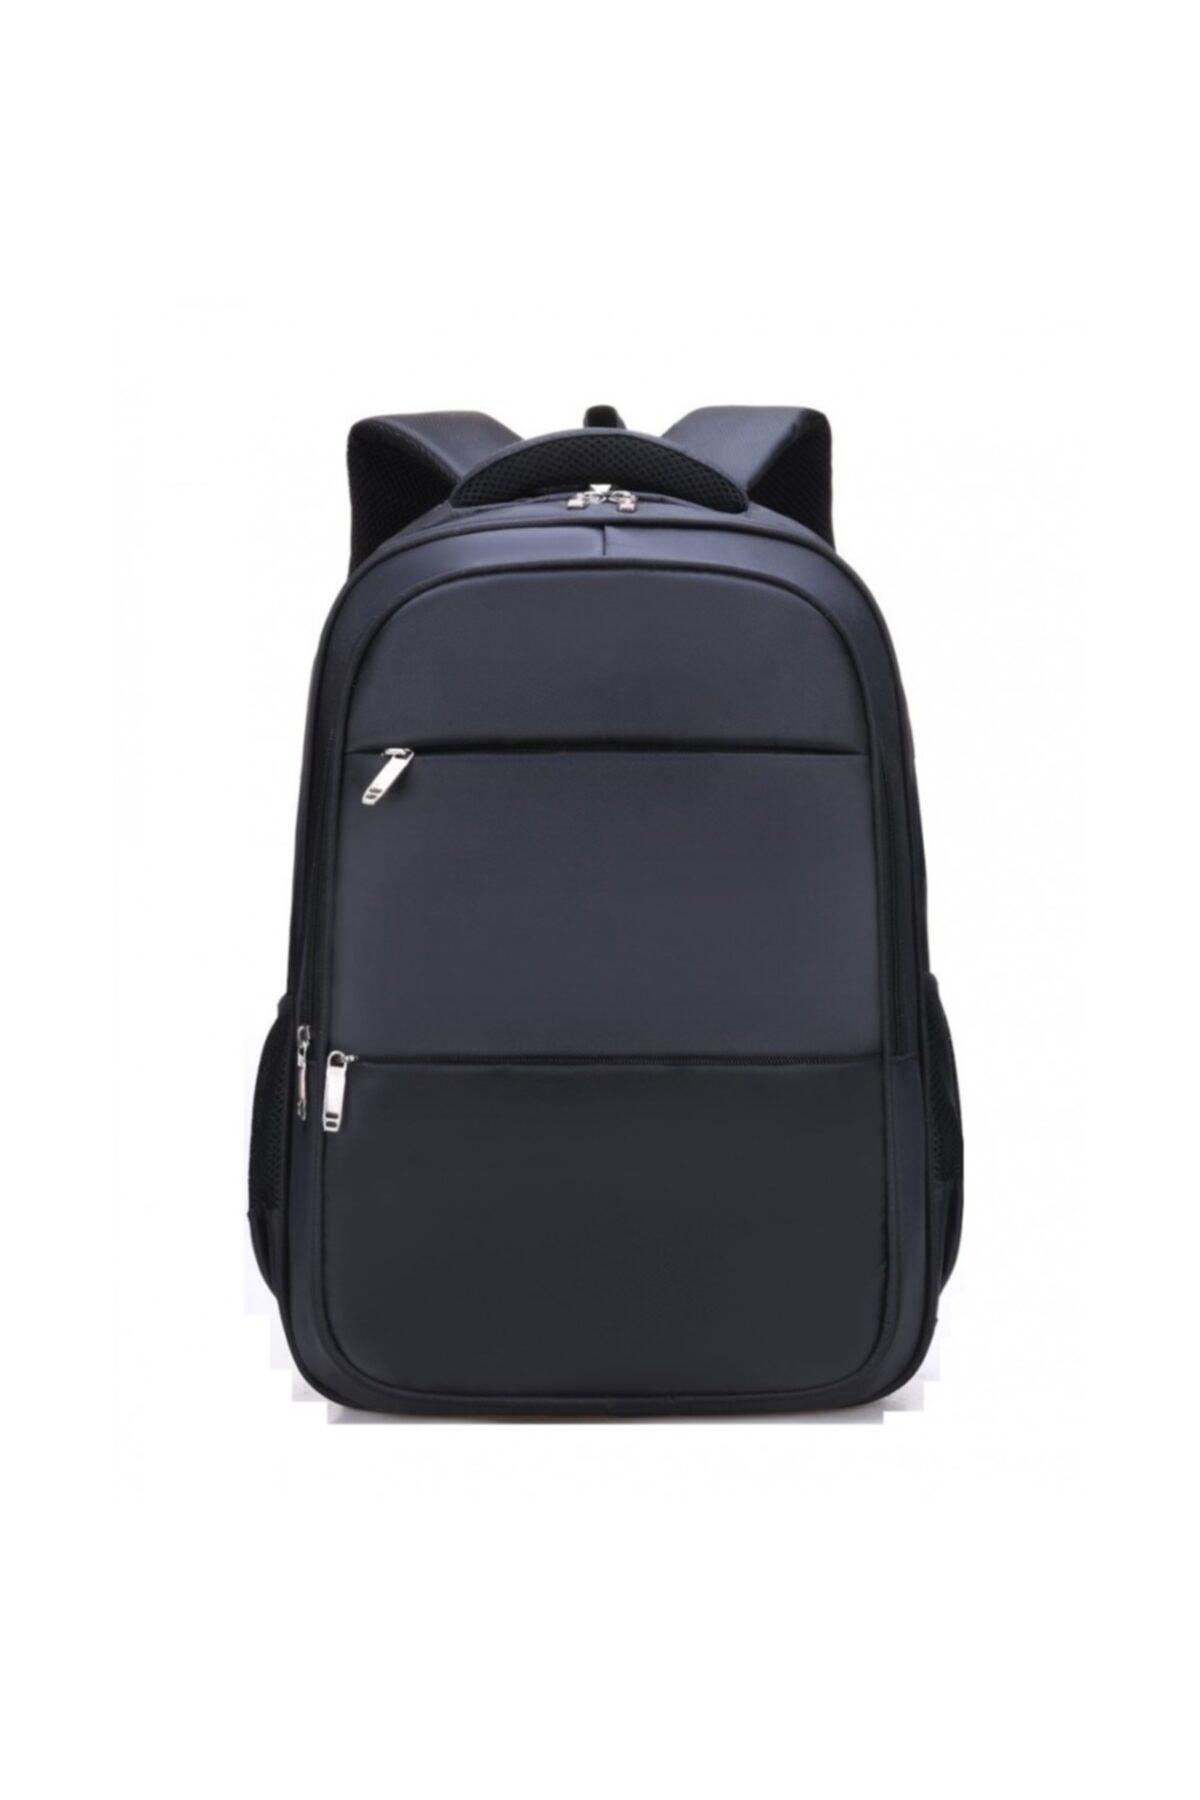 SYG Laptop/notebook Sırt Çantası (17 Inç) Siyah 1